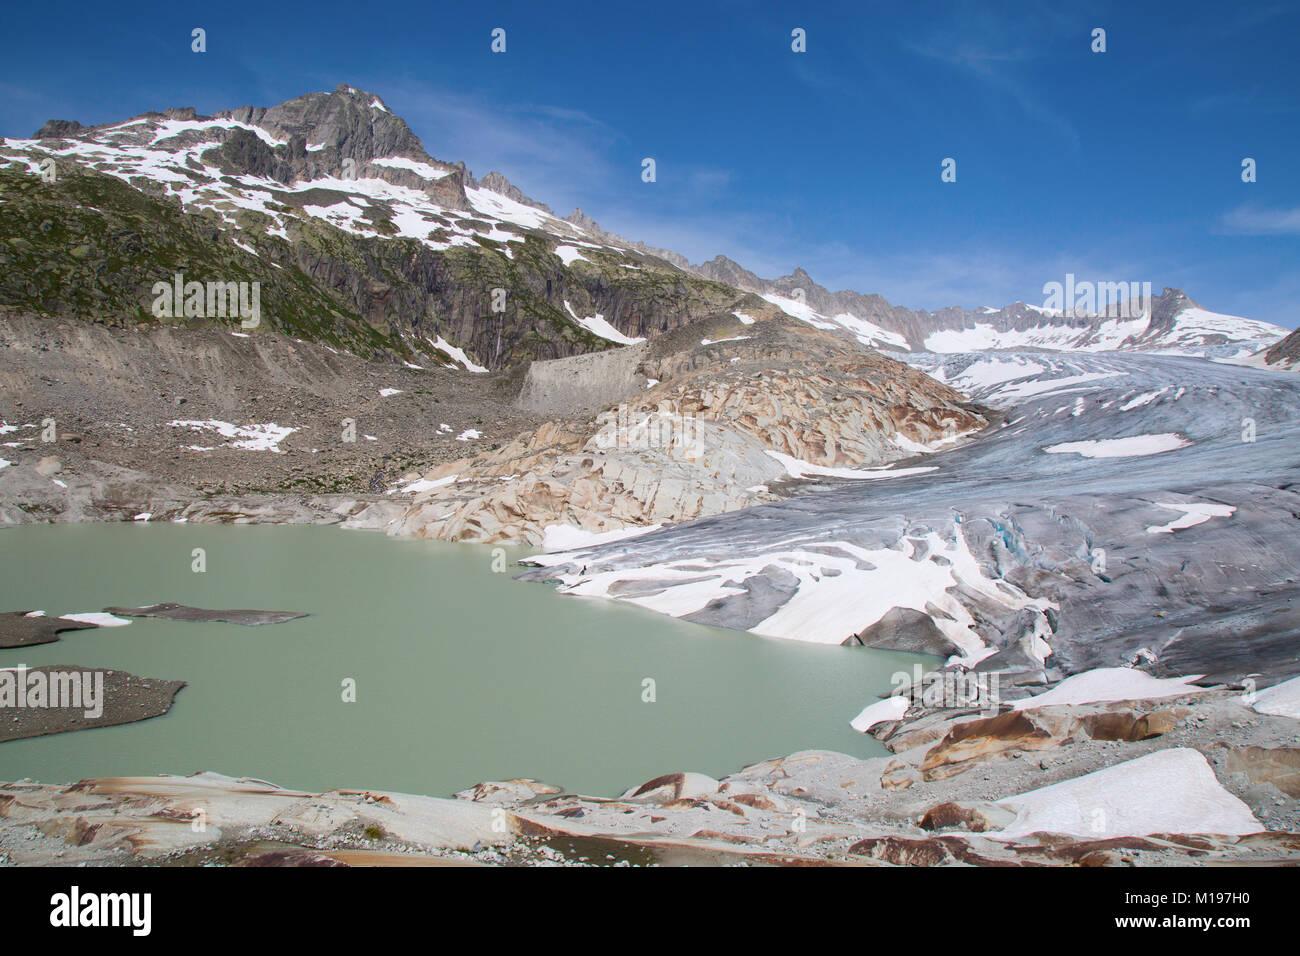 Rhone glacier, source of Rhone river Stock Photo